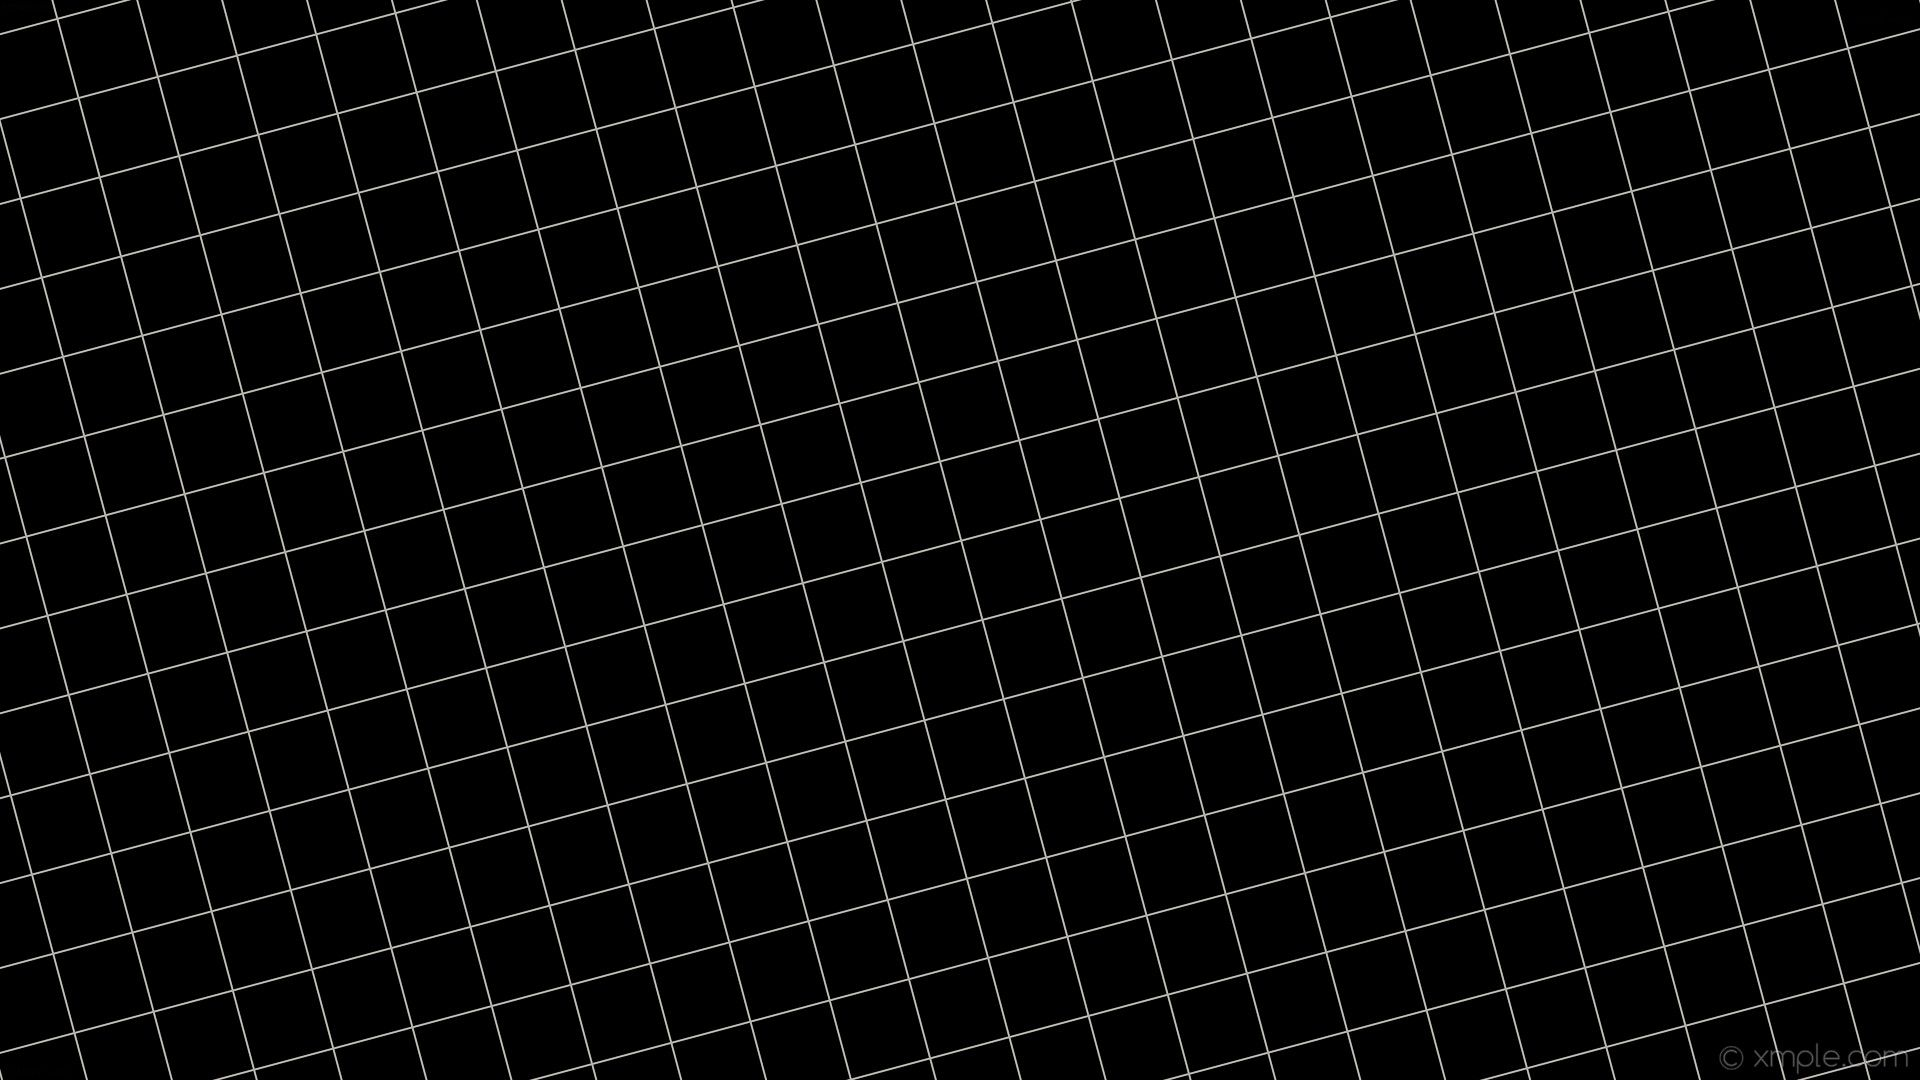 Dark Aesthetic Tumblr Desktop Wallpapers Top Free Dark Aesthetic Tumblr Desktop Backgrounds Wallpaperaccess